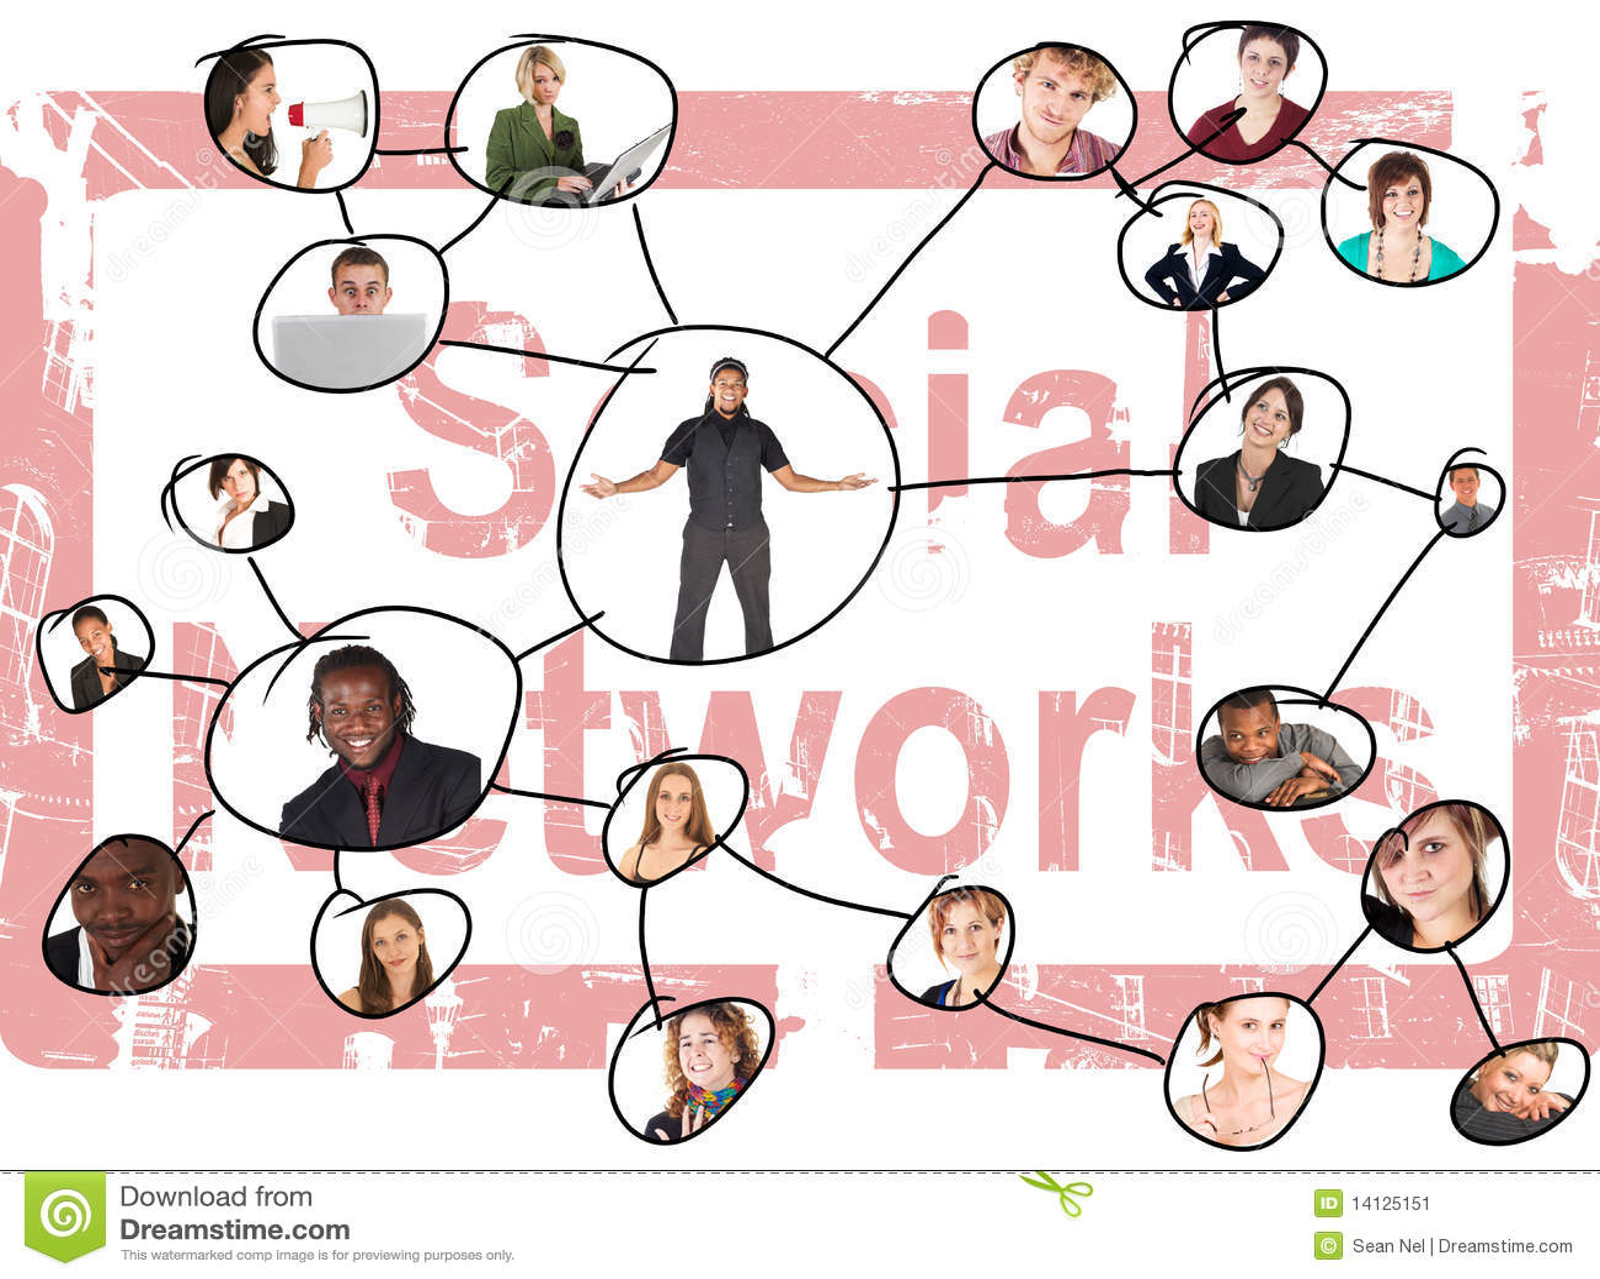 Sozialnetze